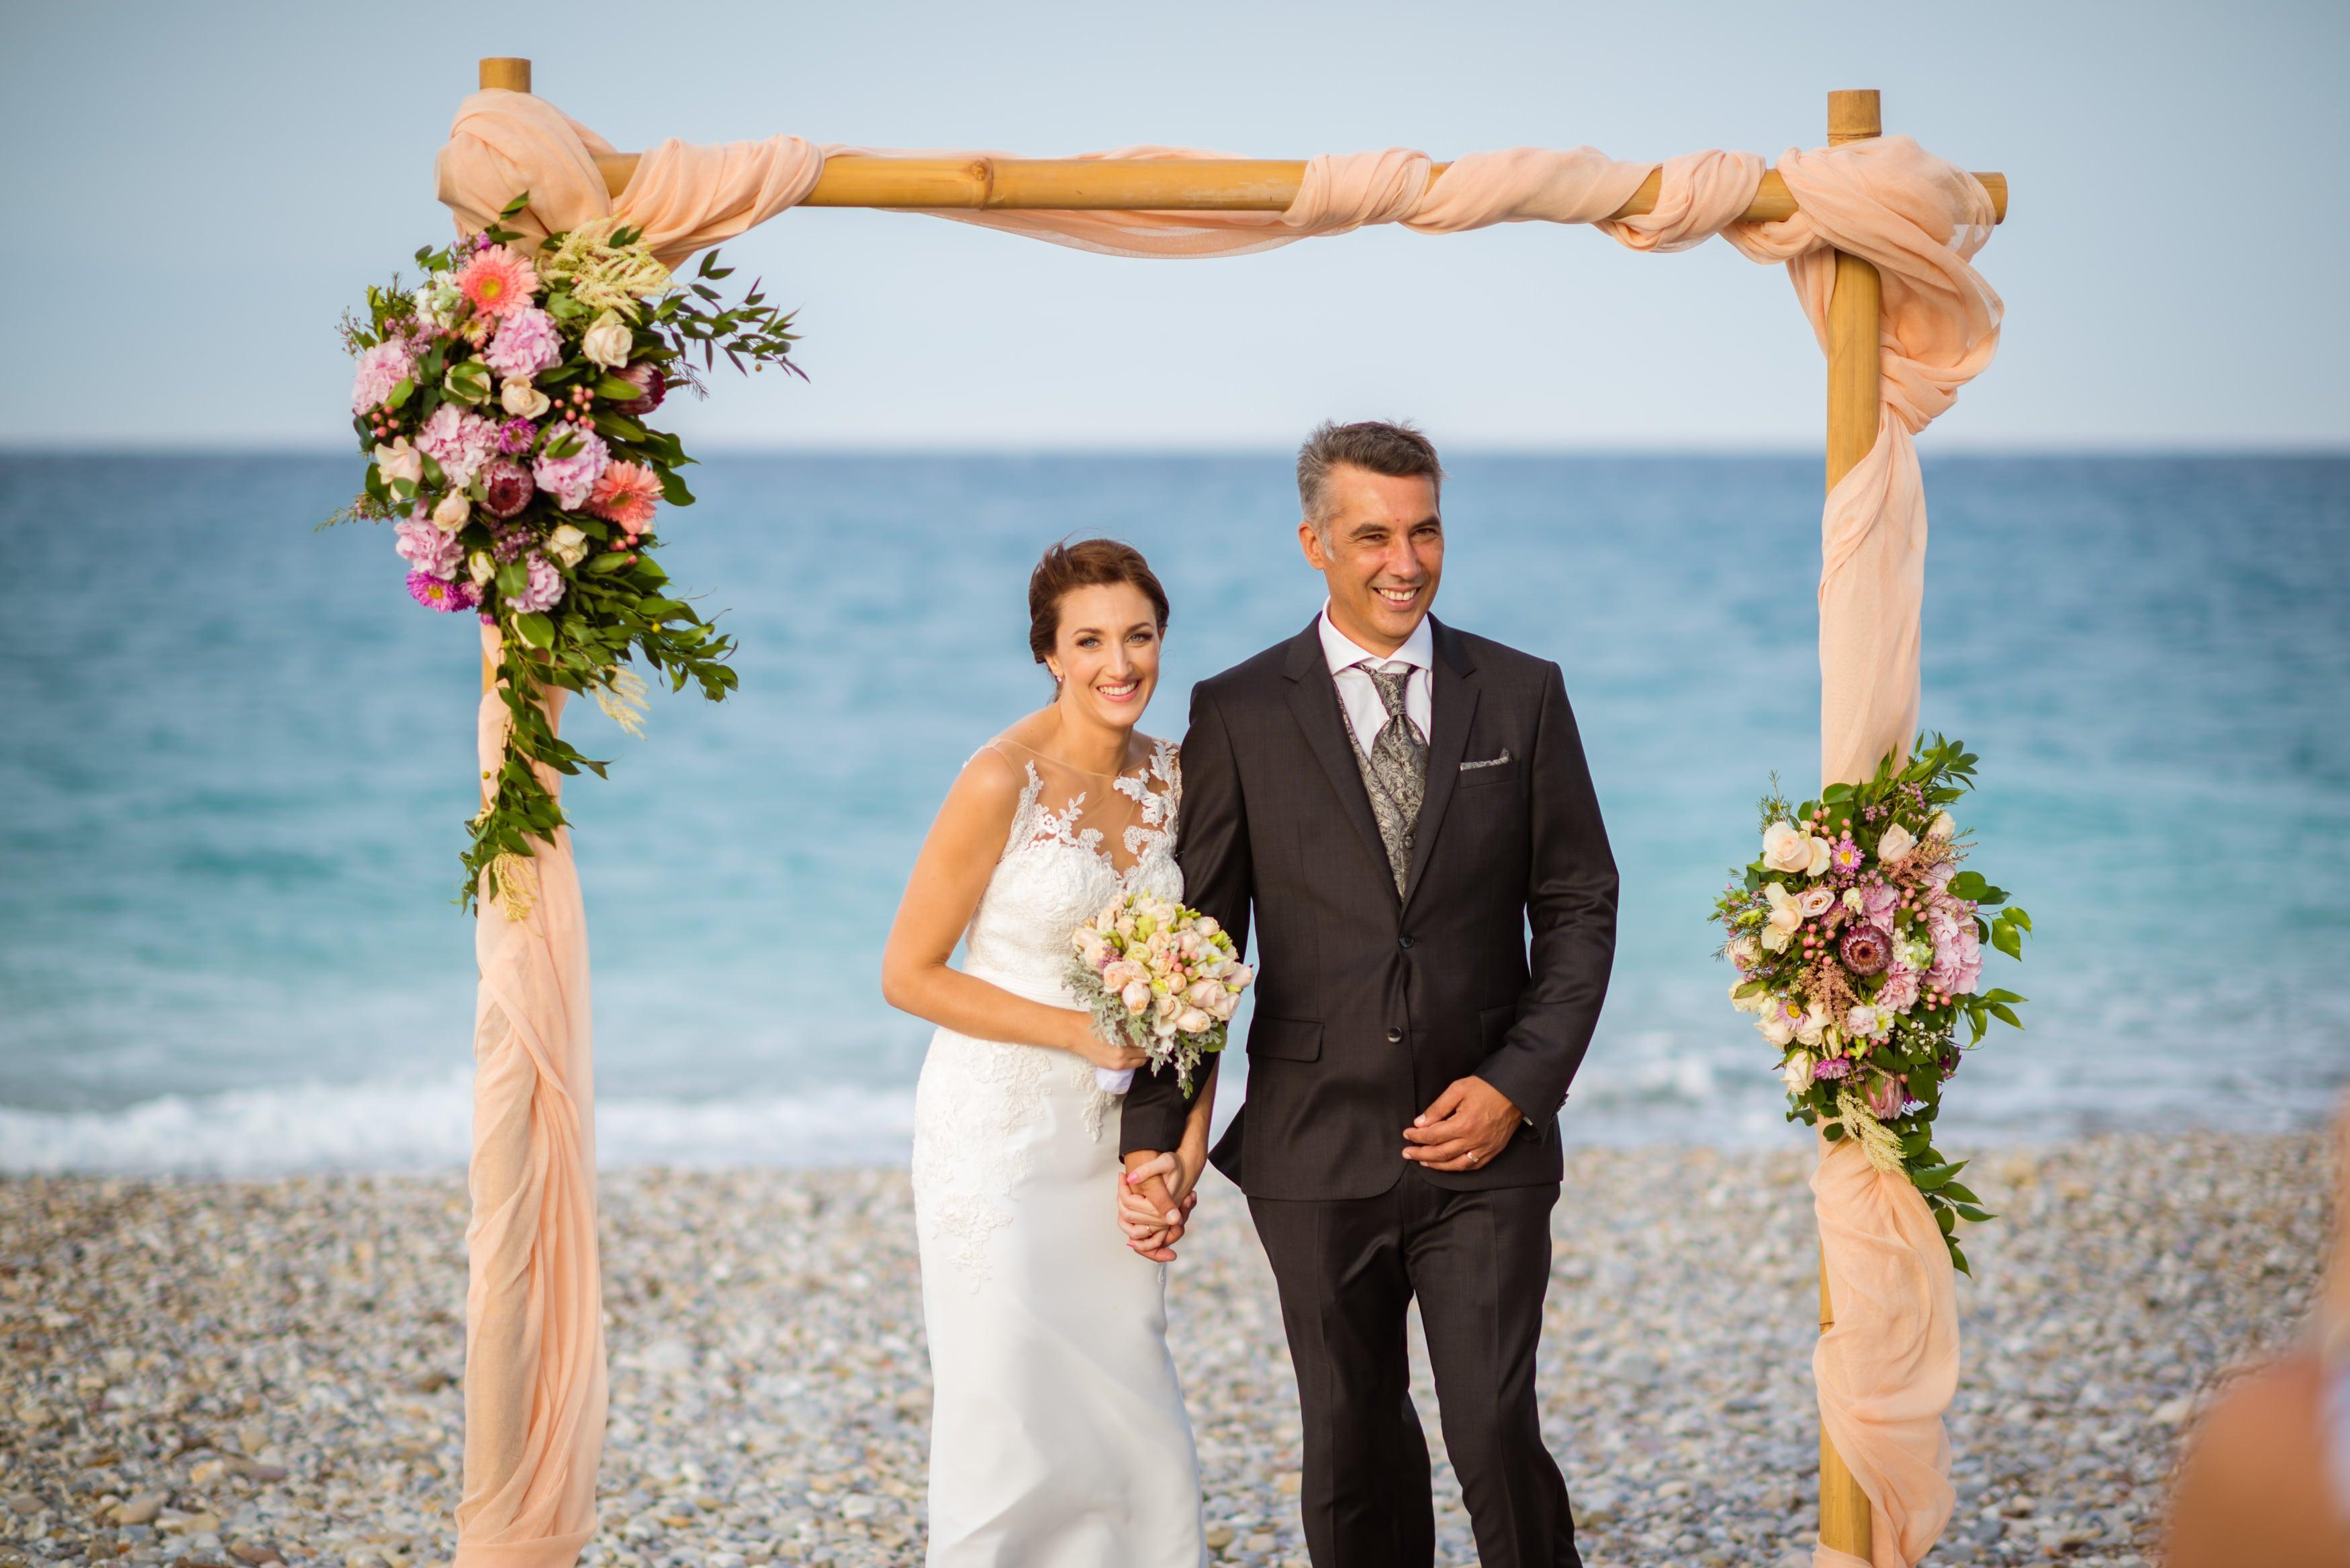 aristocratic-wedding-in-greece-lafete0695-min